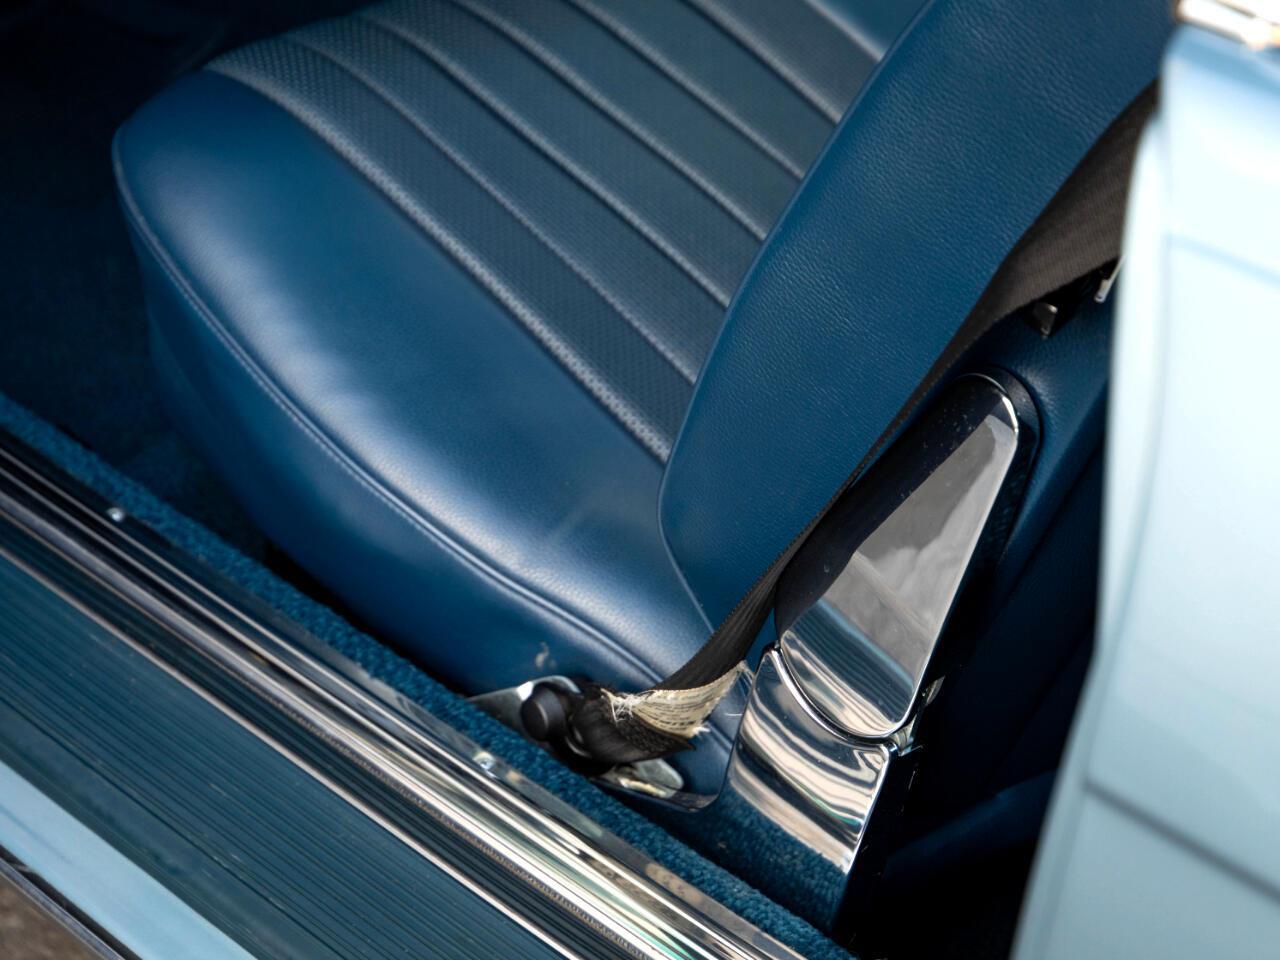 1975 Mercedes-Benz 450SL (CC-1422499) for sale in Marina Del Rey, California